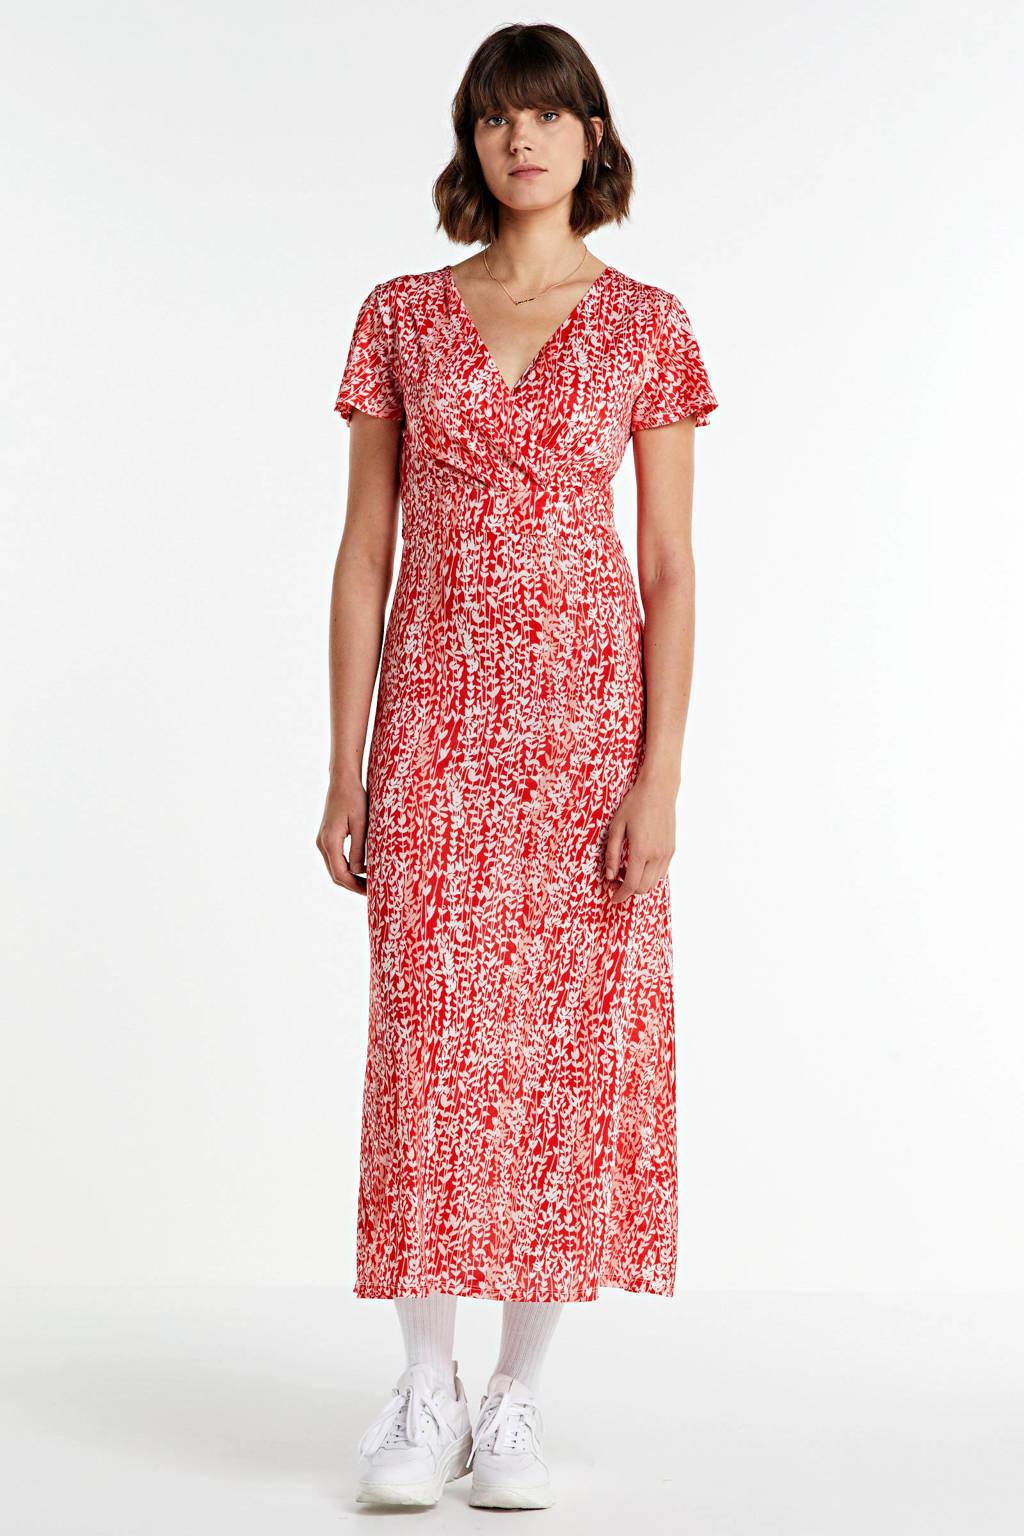 Smashed Lemon maxi jurk met all over print en ceintuur rood/wit, Rood/wit